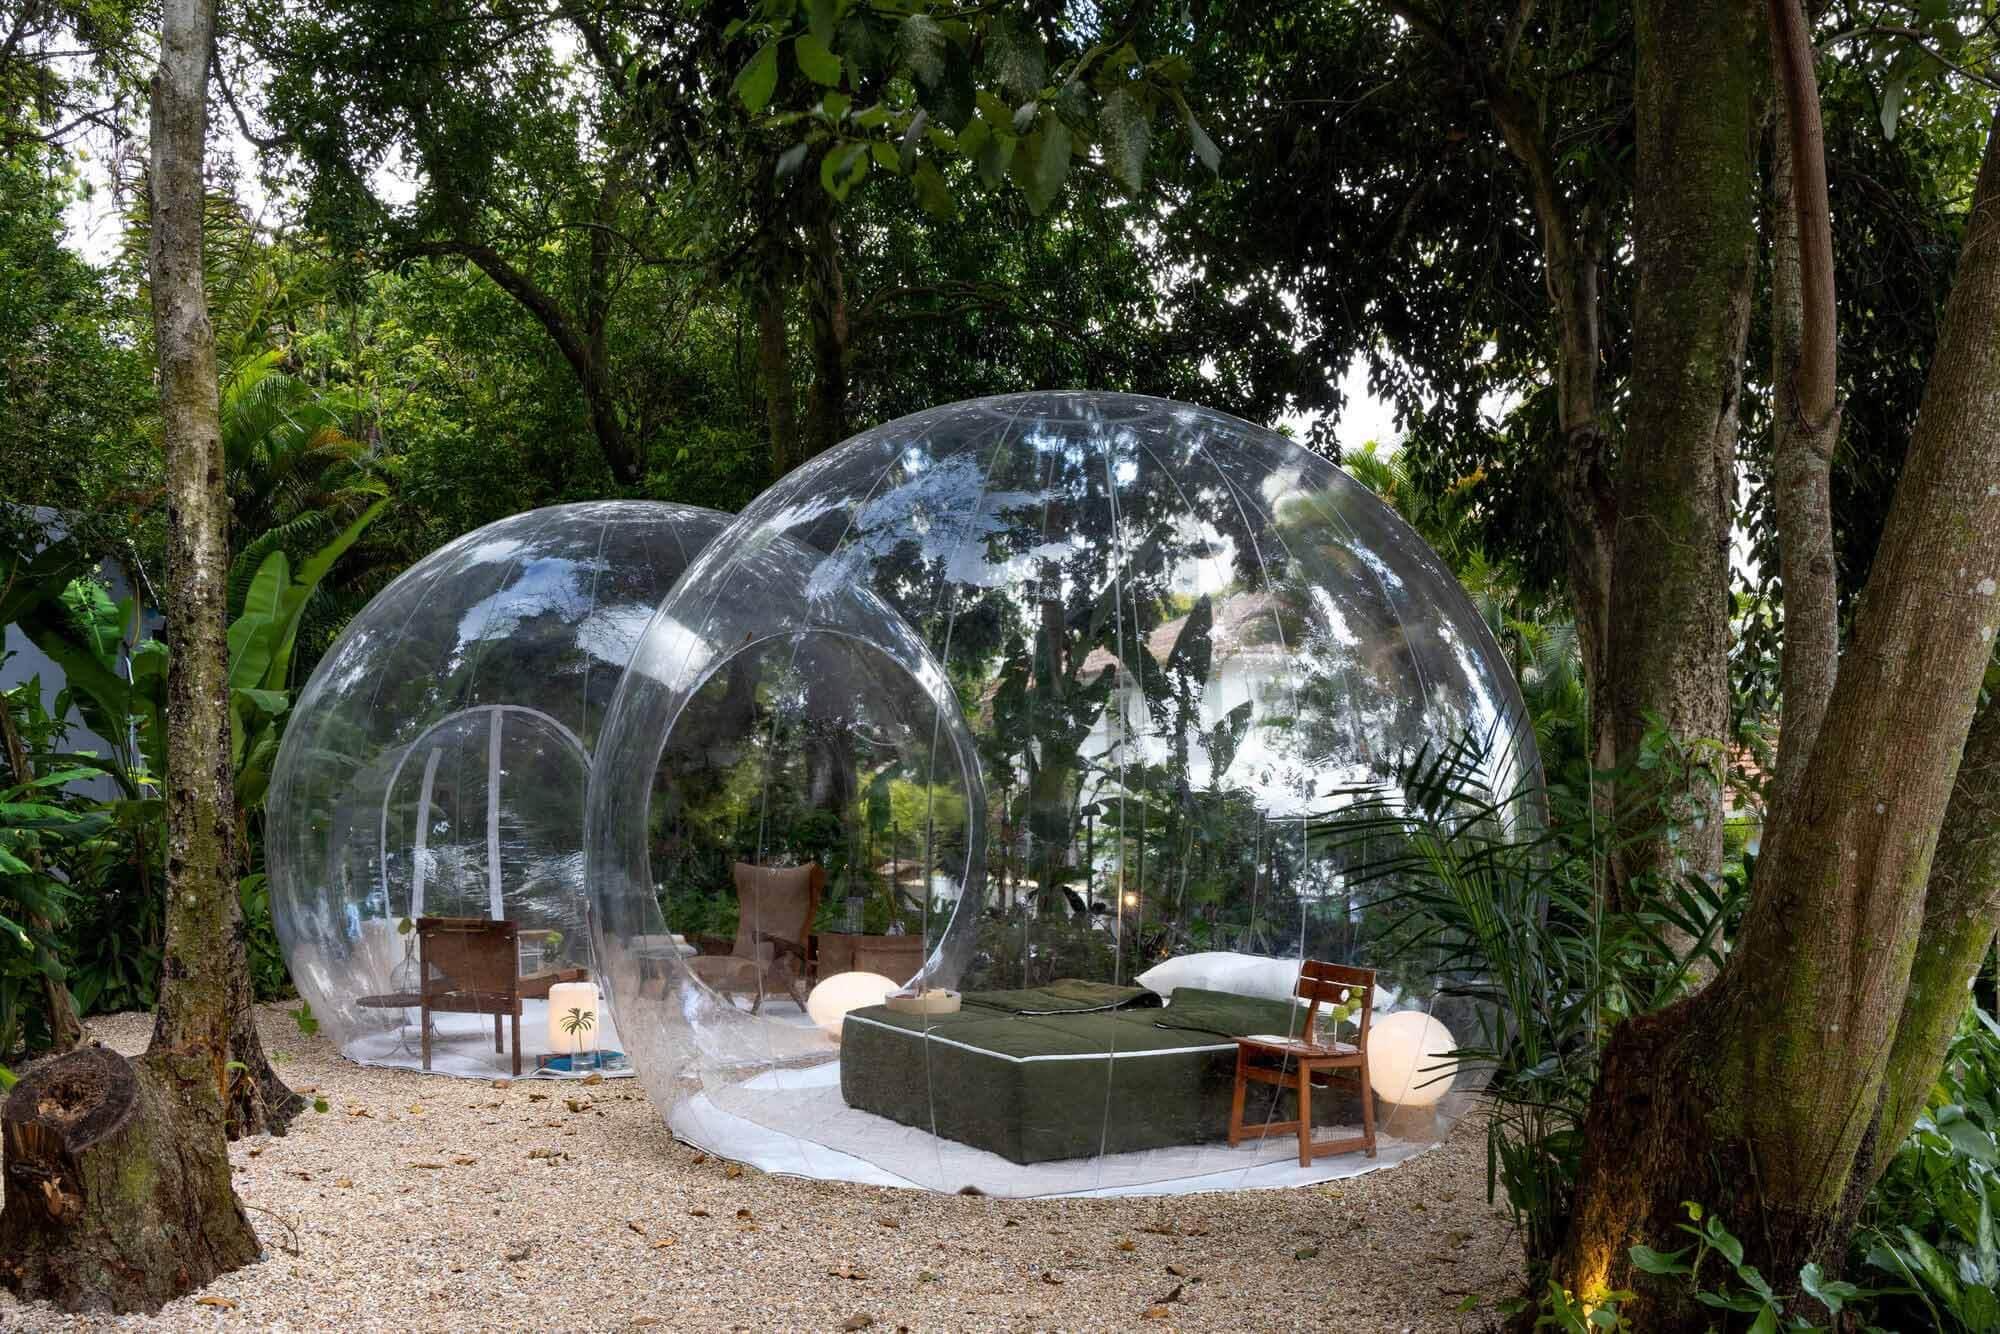 Секретный сад / Диего Рапозо + Аркитетос